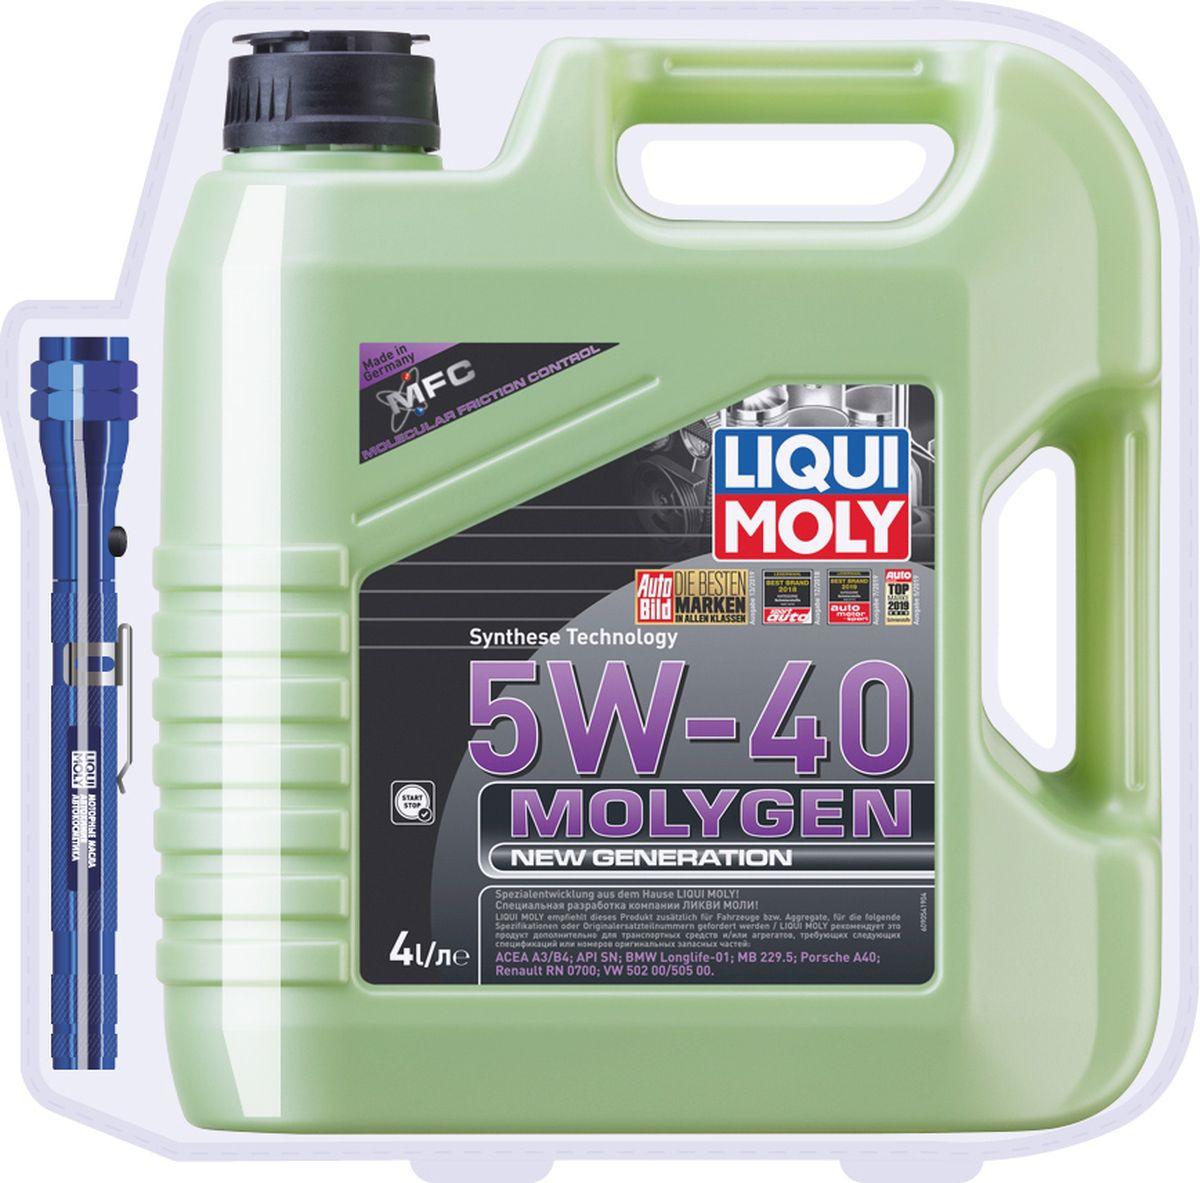 Моторное масло Liqui Moly Molygen New Generation, НС-синтетическое, 5W-40, 4 л + Фонарик в подарок 9042d liquimoly нс синт мот масло molygen new generation 5w 30 4л фонарик арт 7520r